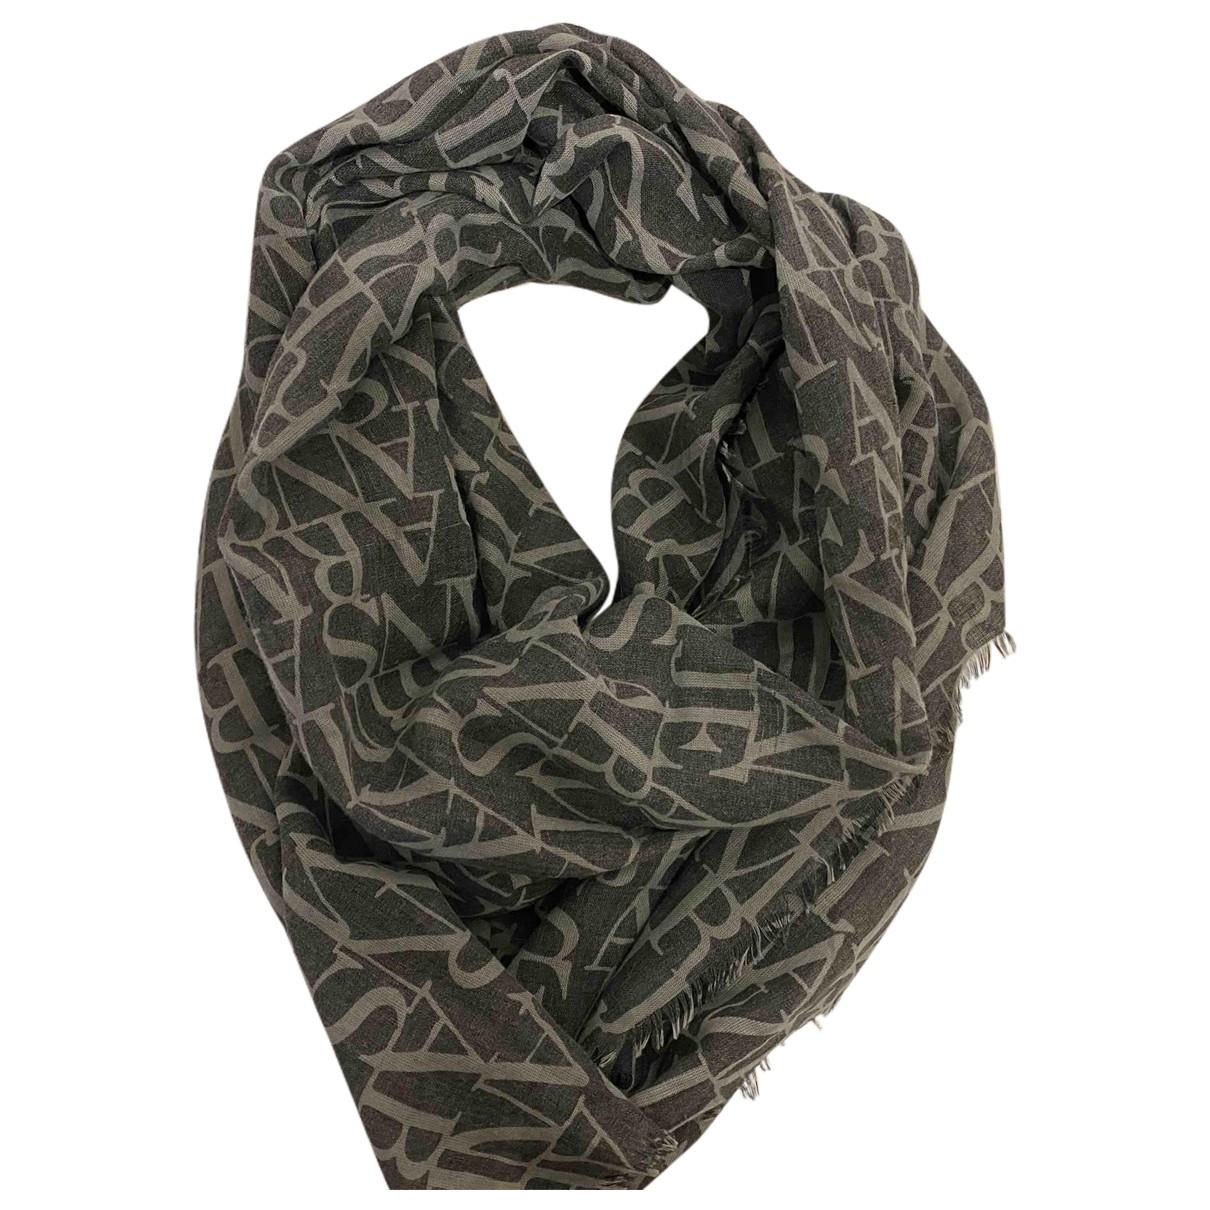 Armani Jeans N Grey Cotton scarf & pocket squares for Men N